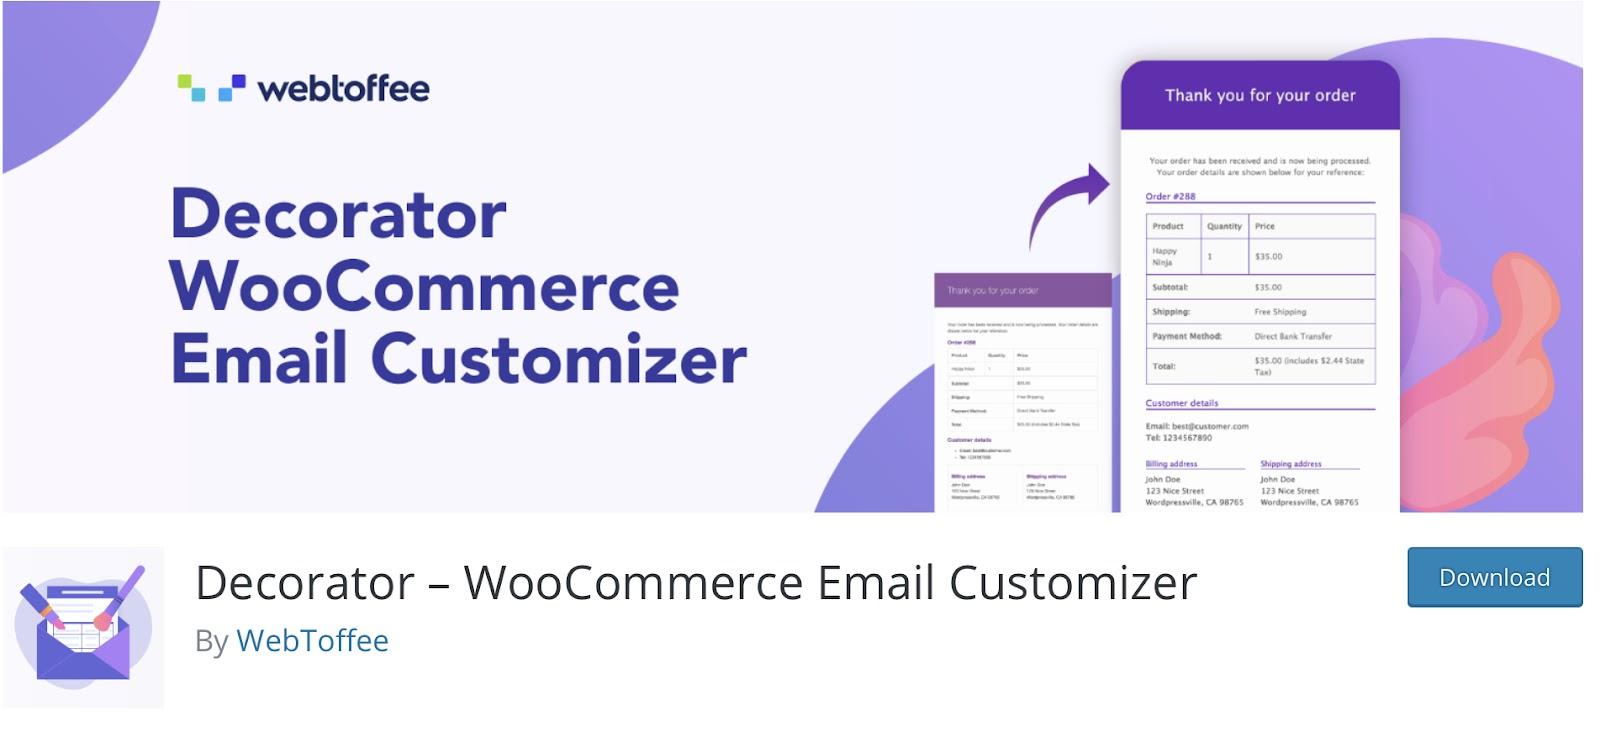 Decorator WooCommerce Email Customizer